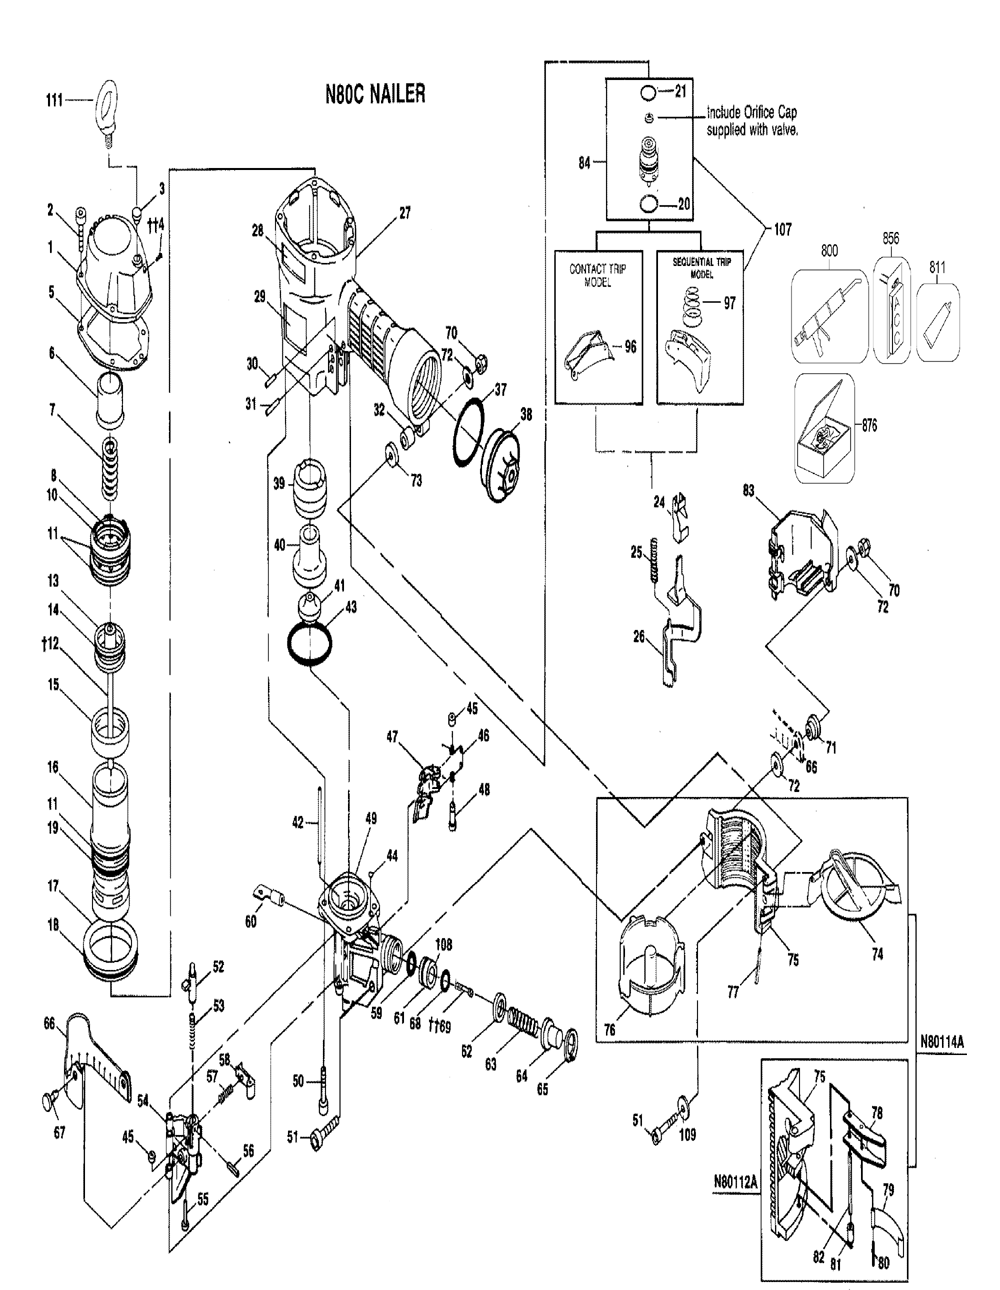 Charmant Spule Framing Nailer Galerie - Rahmen Ideen ...